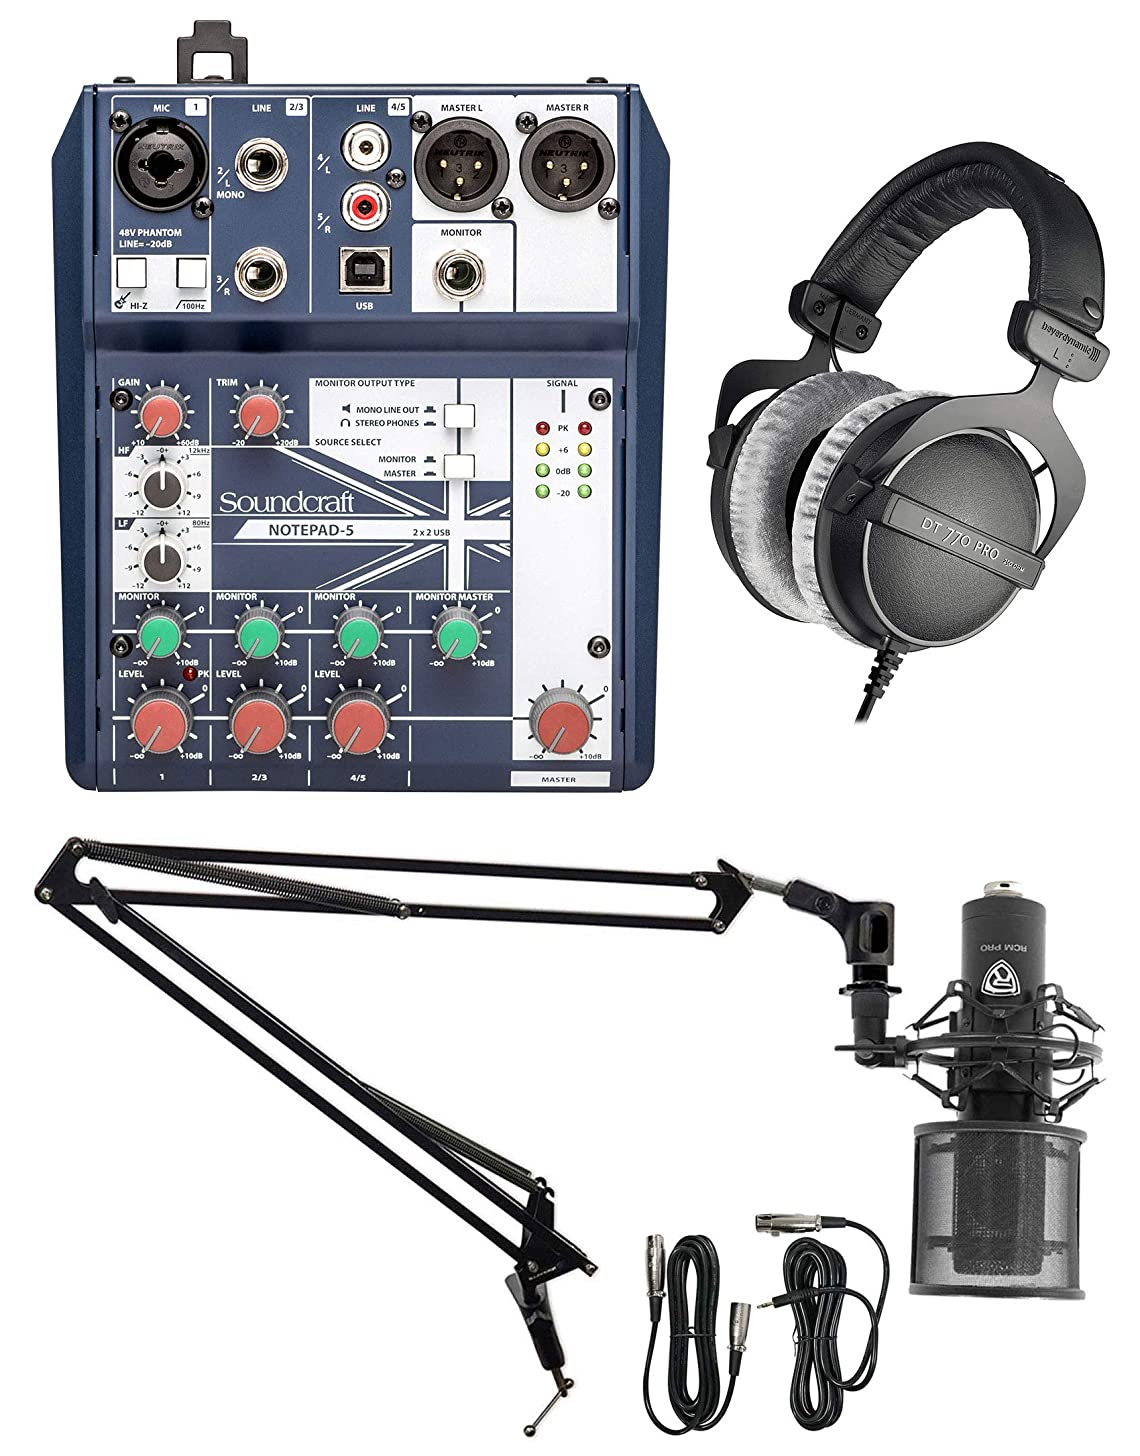 Gaming Twitch Live Stream Kit Soundcraft Mixer+Beyerdynamic Headphones+Mic+Boom